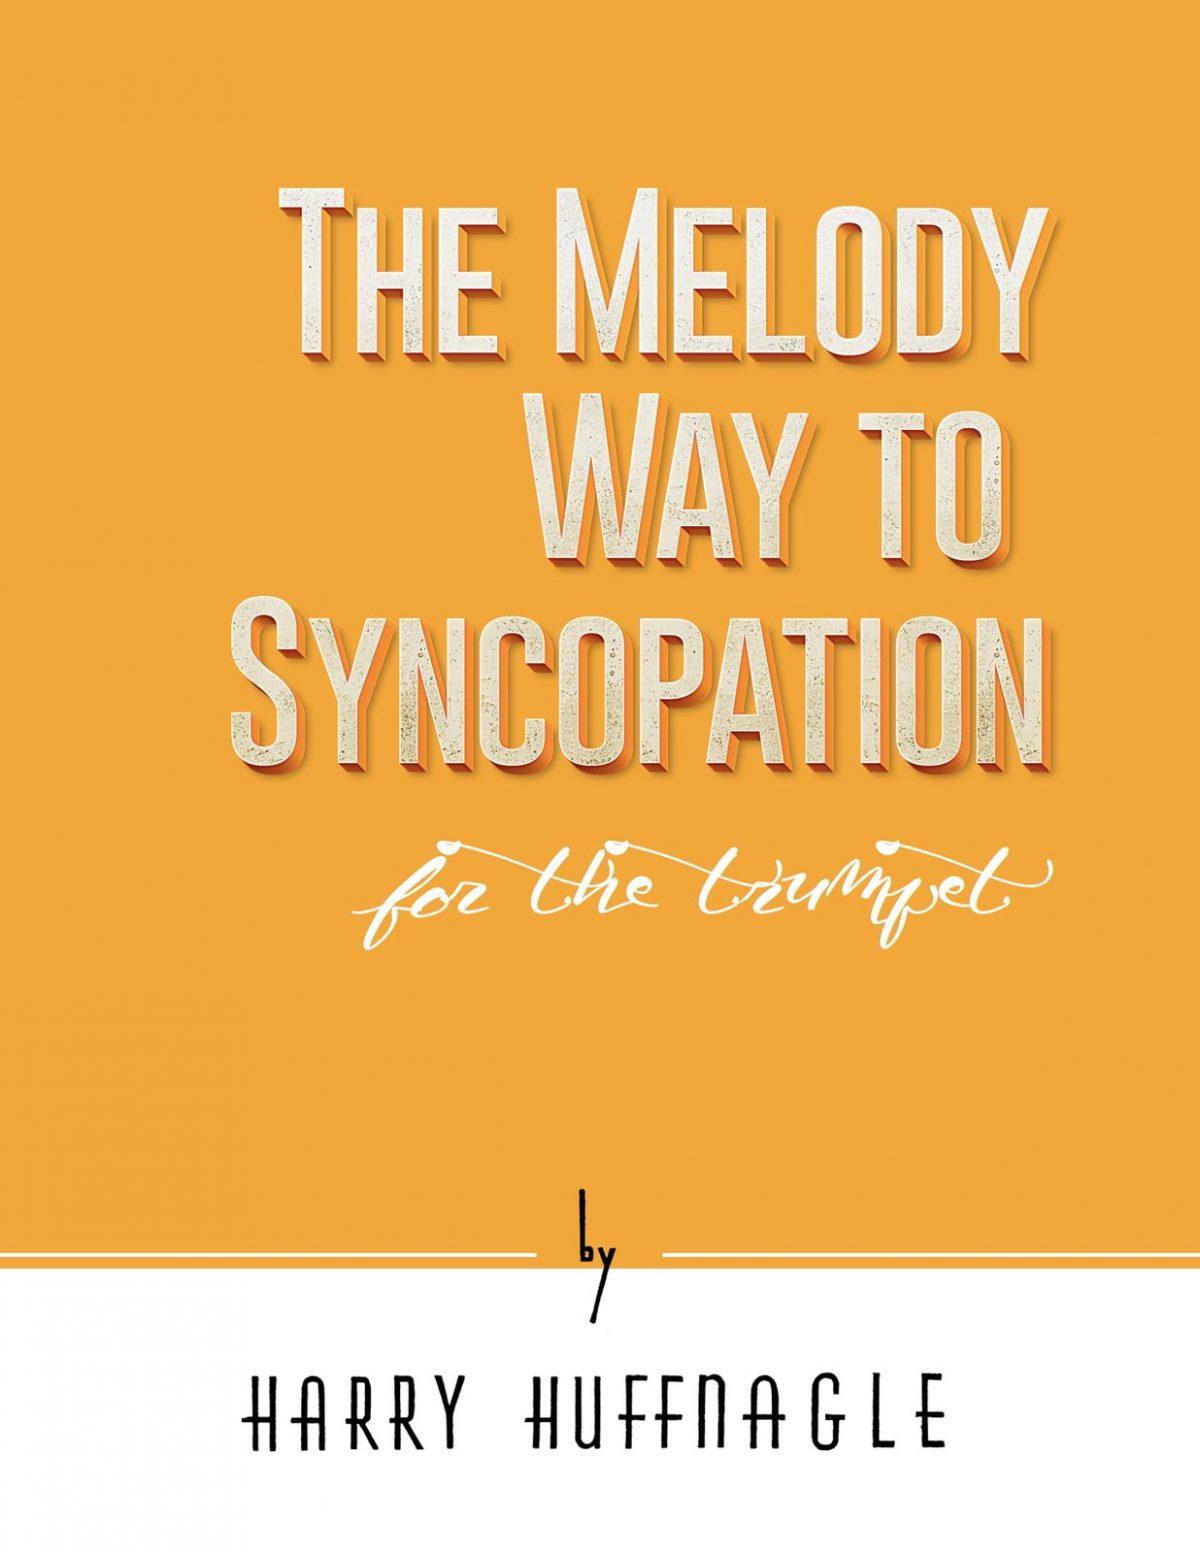 Huffnagle-Gornston, Melody Way to Syncopation-p01